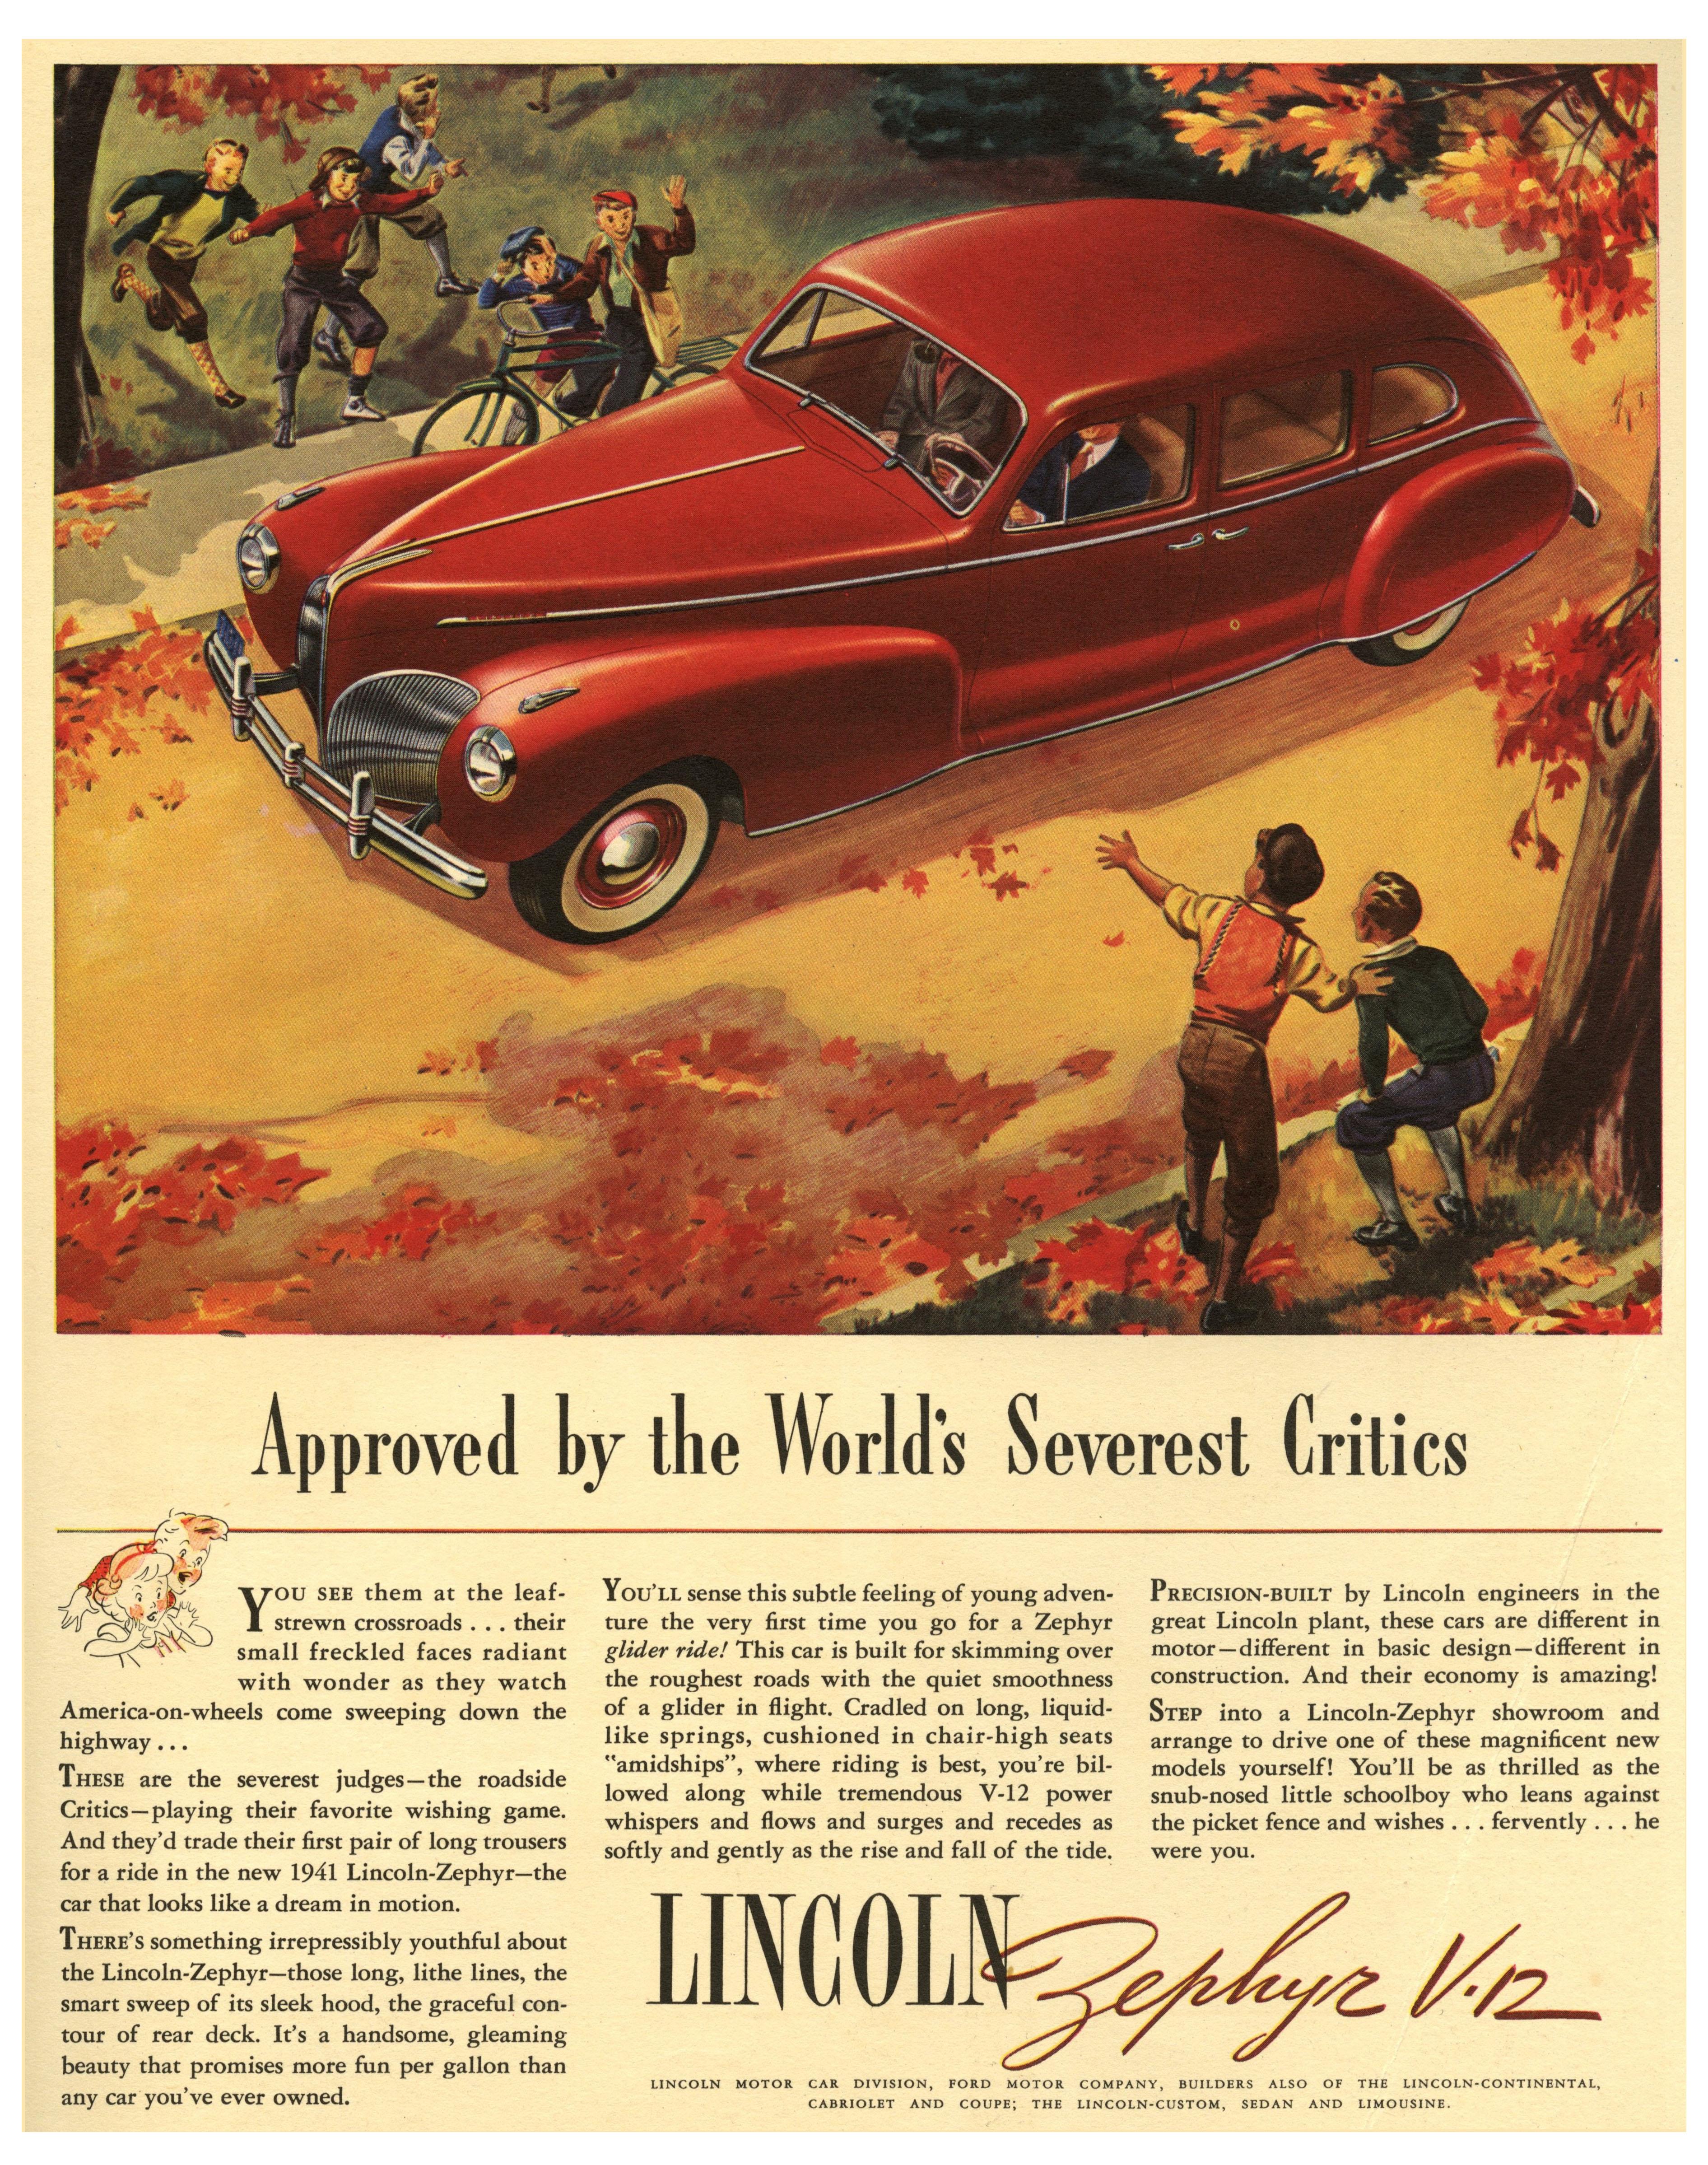 1941 Lincoln-Zephyr